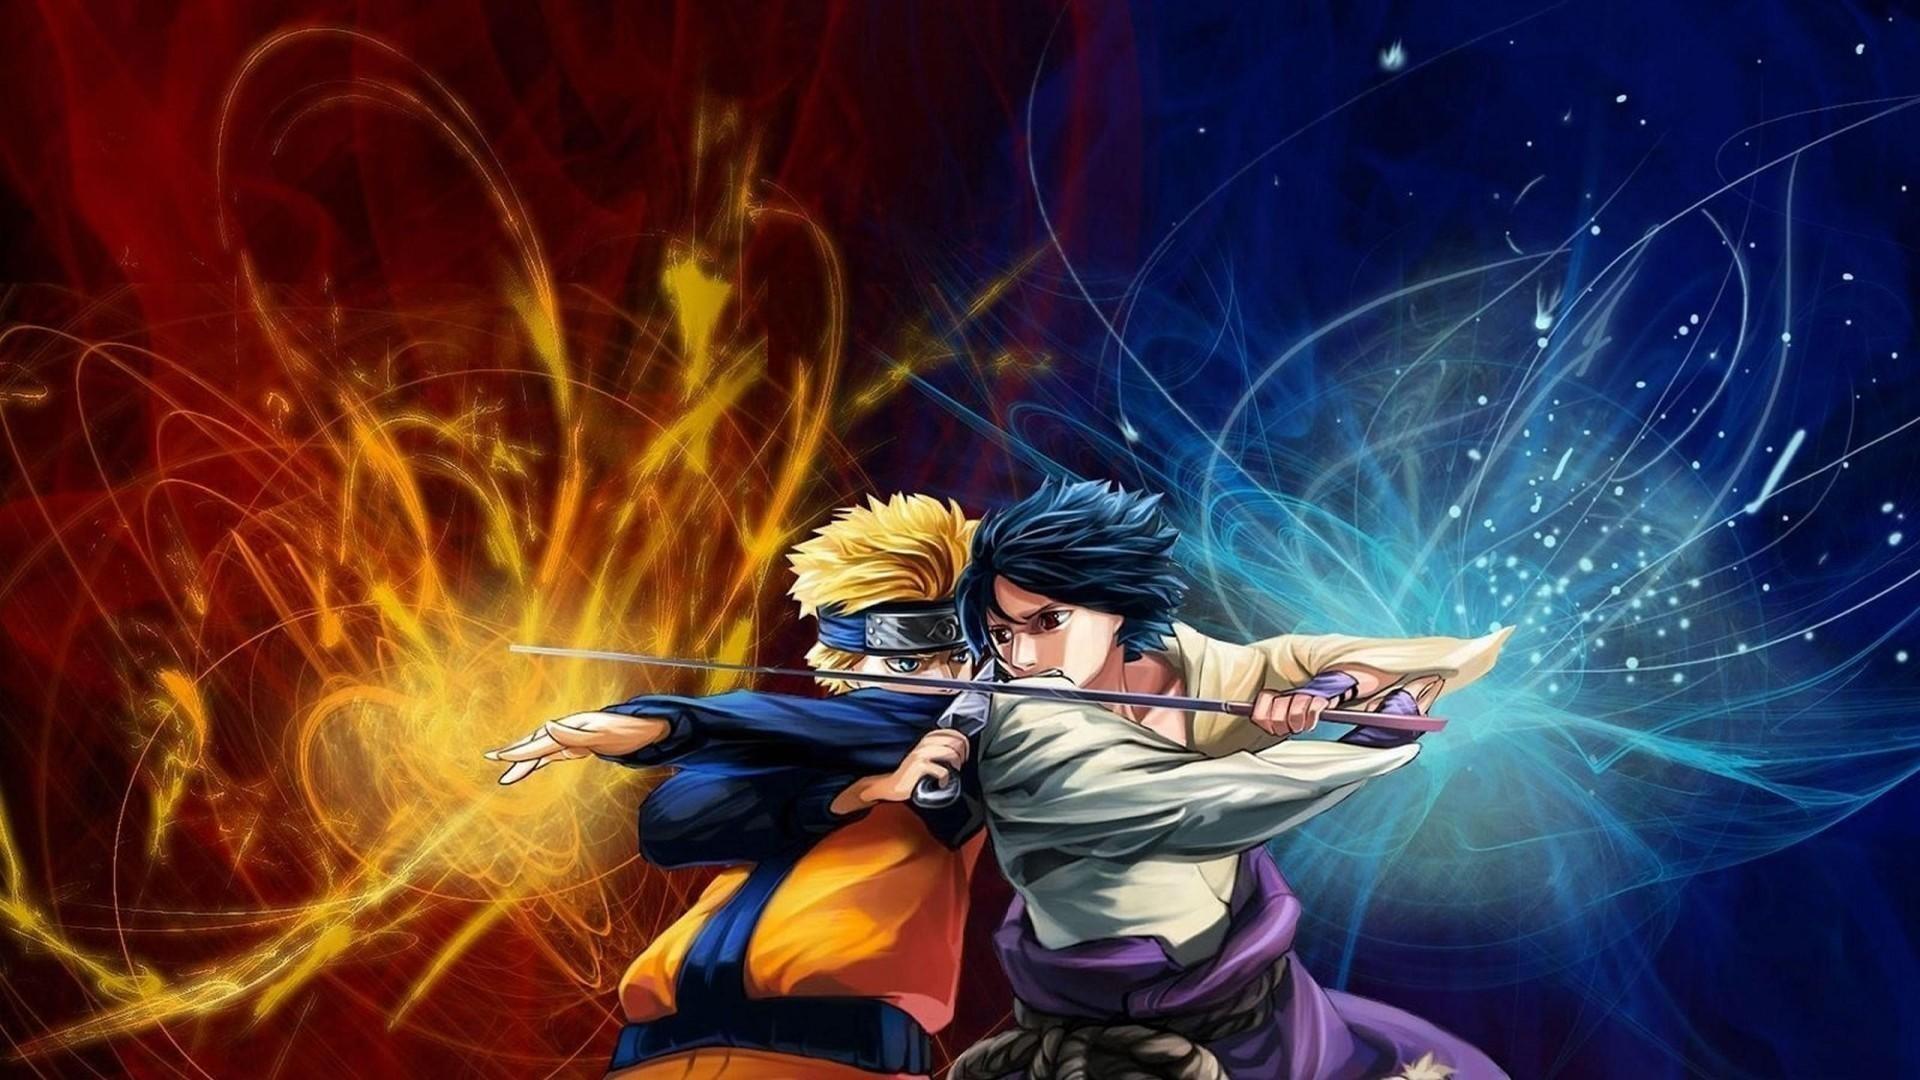 Download 98 Wallpaper Naruto The Last Gratis